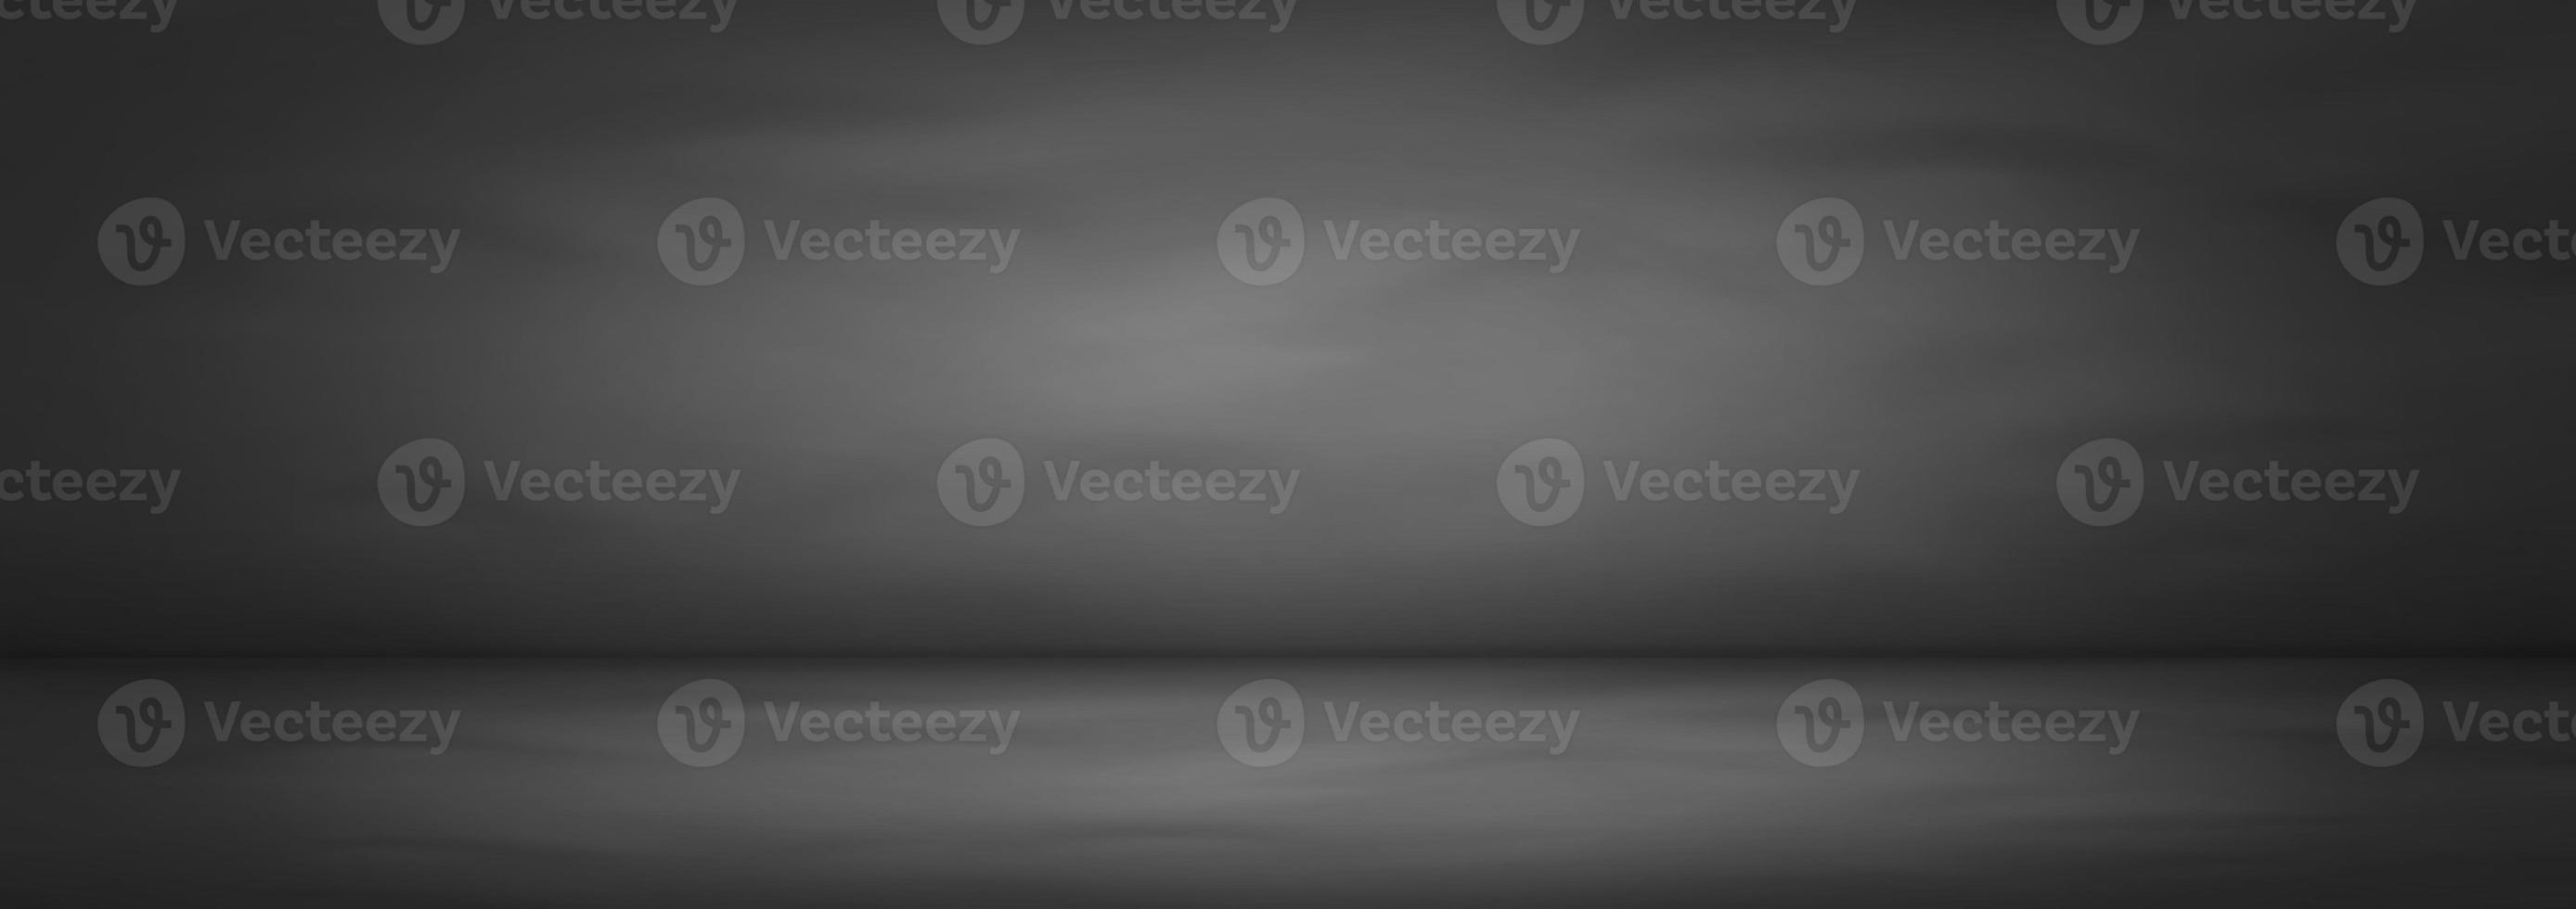 mörkgrå studiorumsbakgrund foto